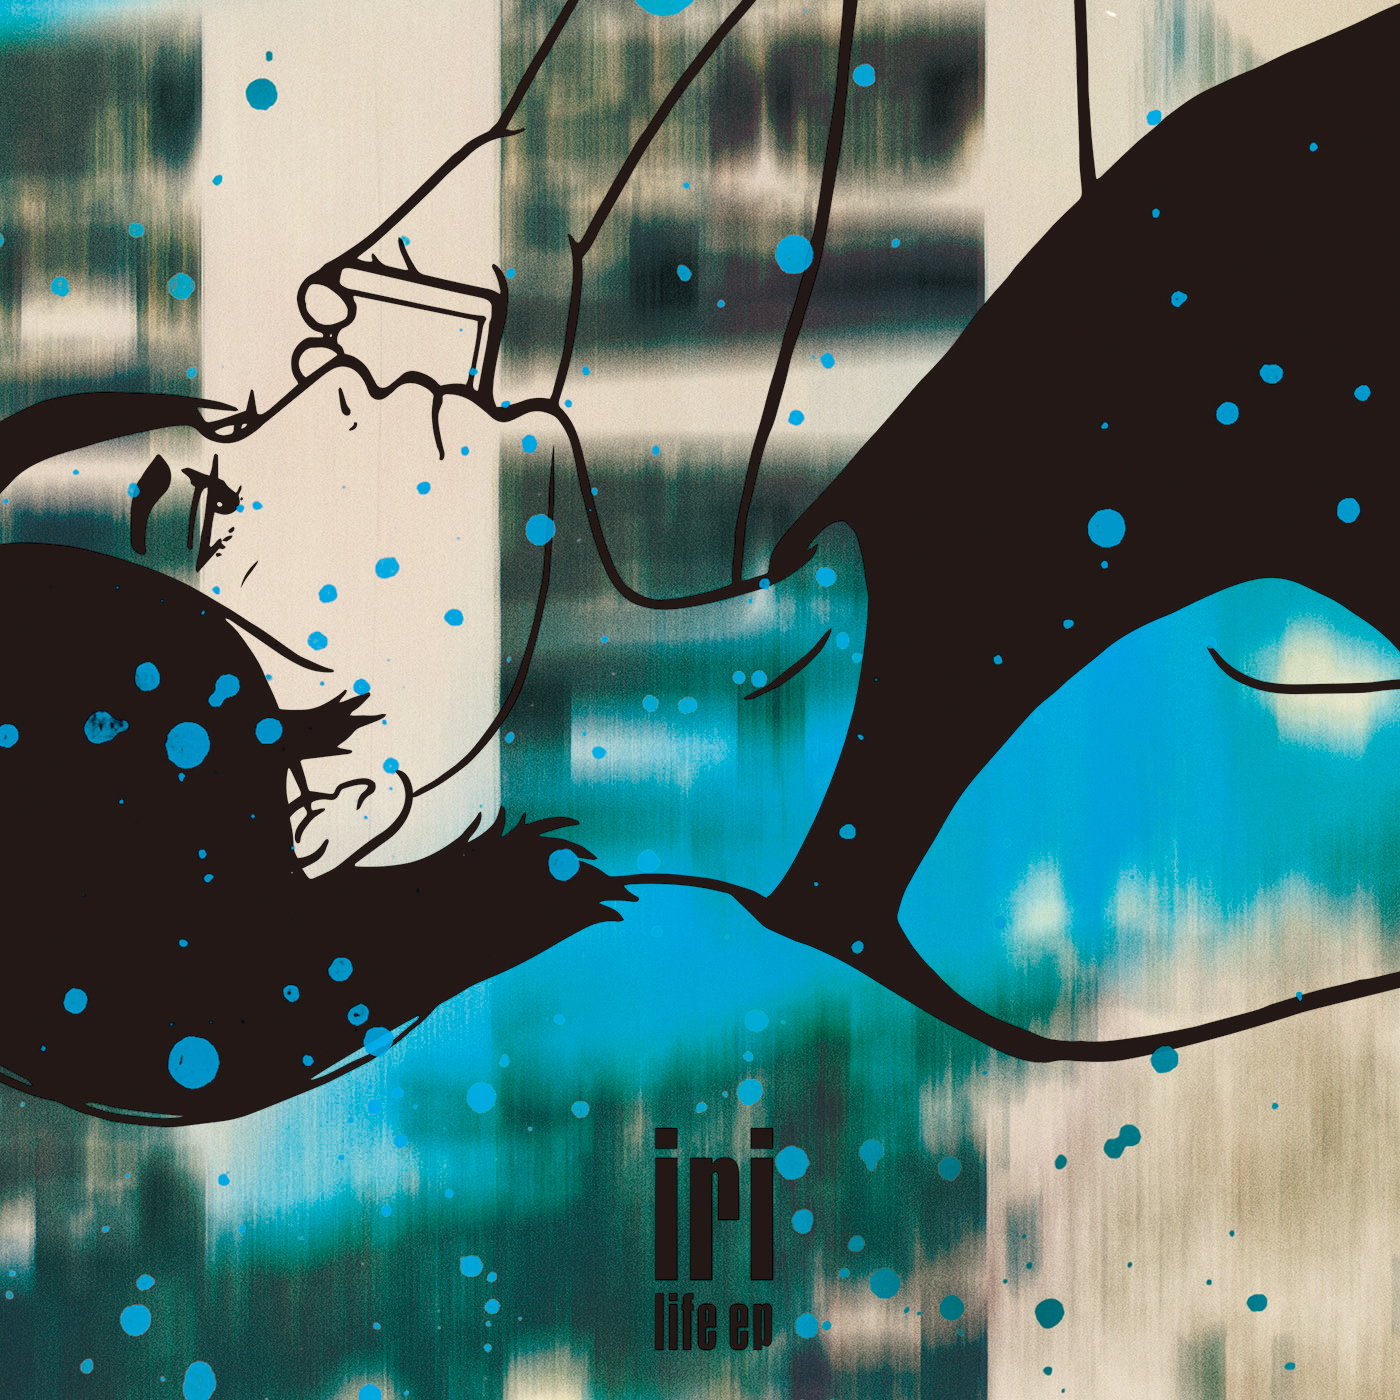 life-ep_Jsha